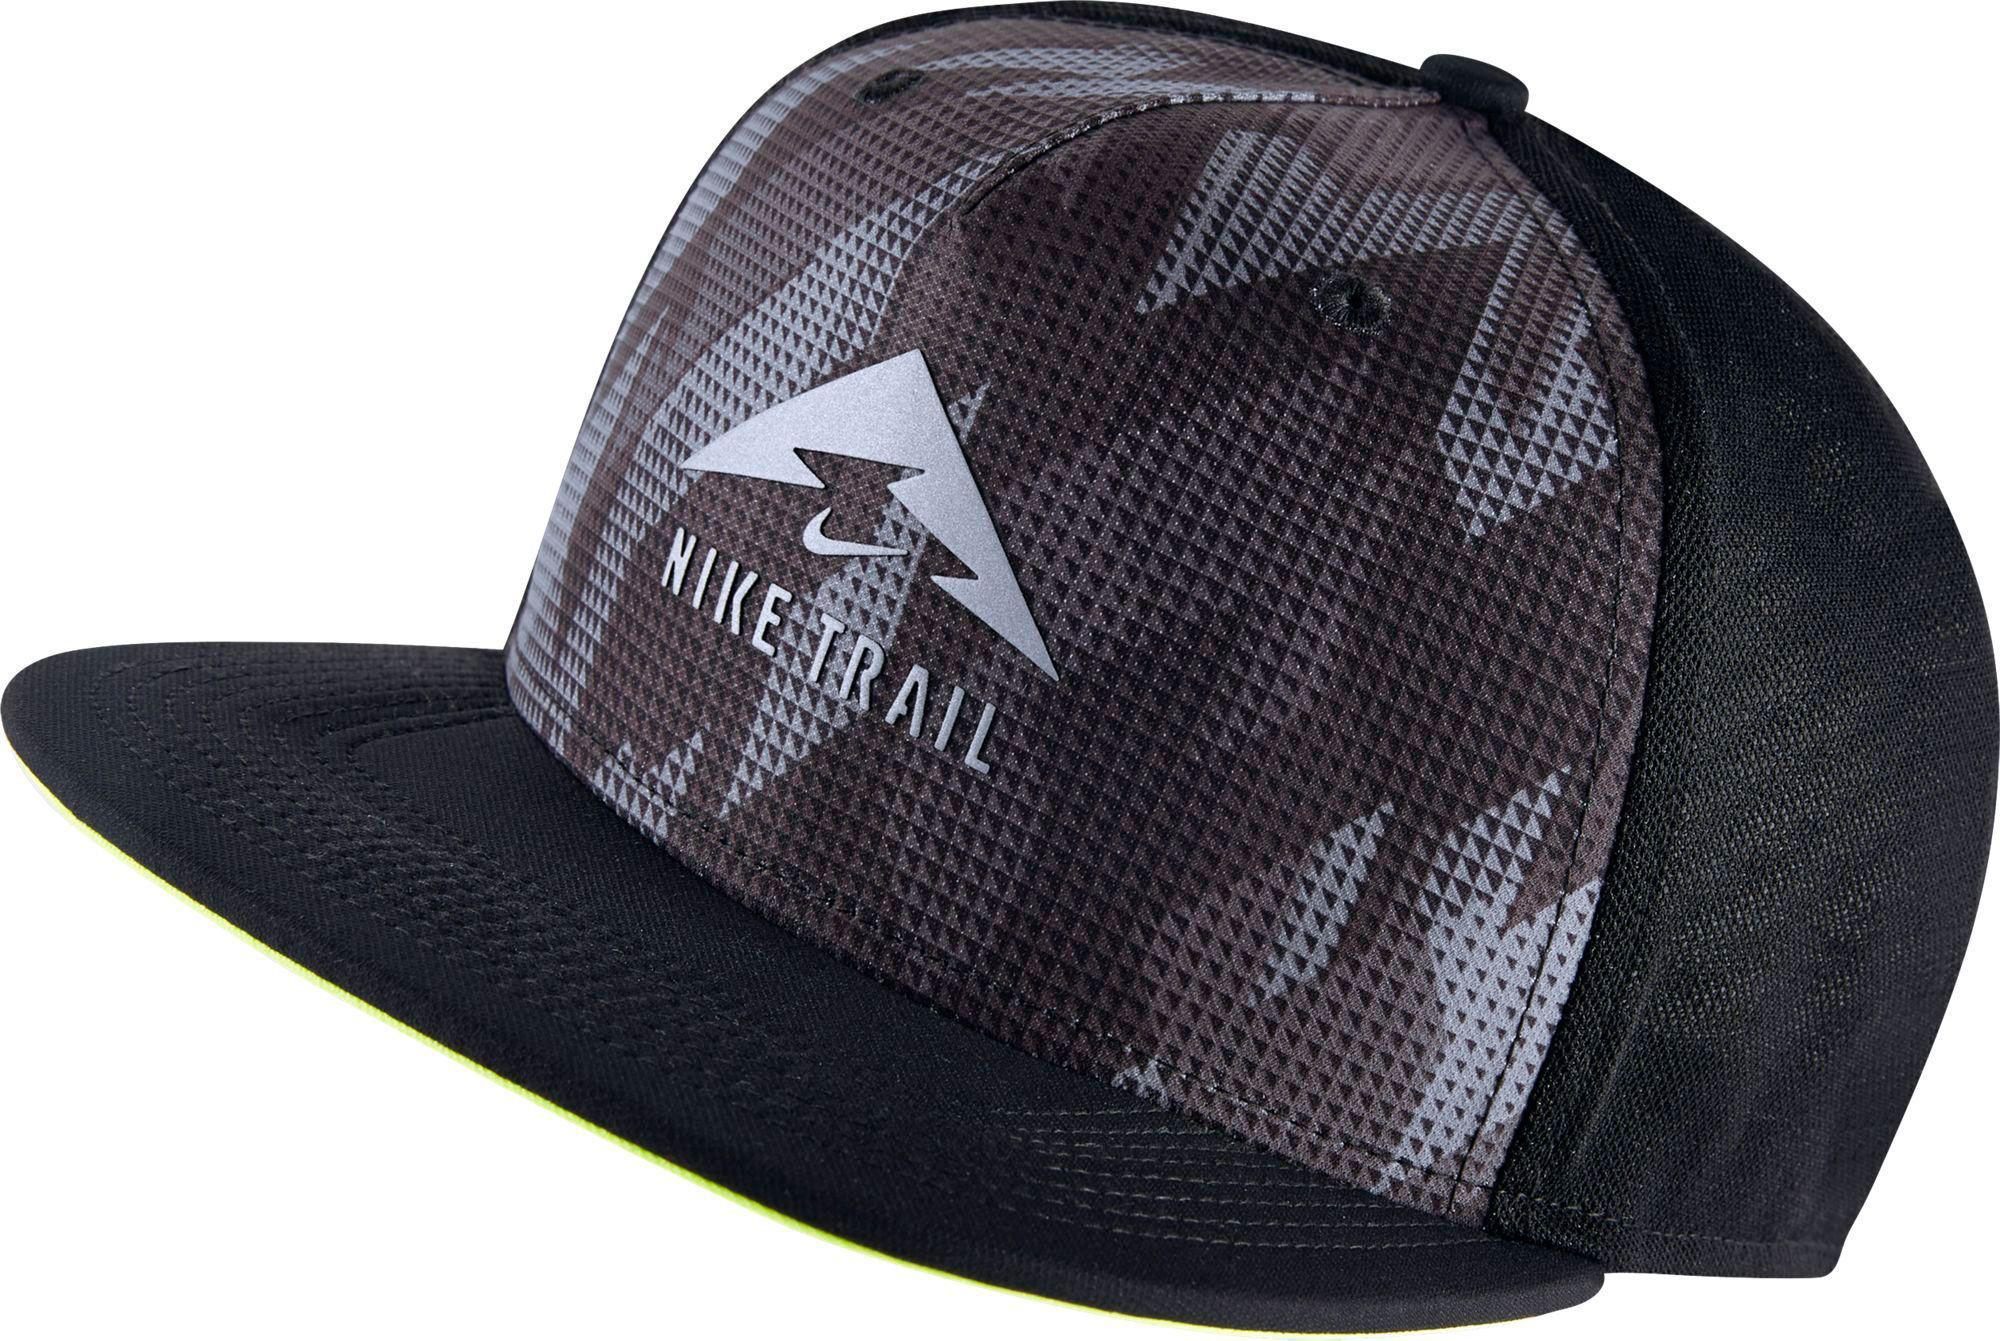 7b5c12d6d0b Lyst - Nike Trail Aerobill Trucker Running Hat in Black for Men